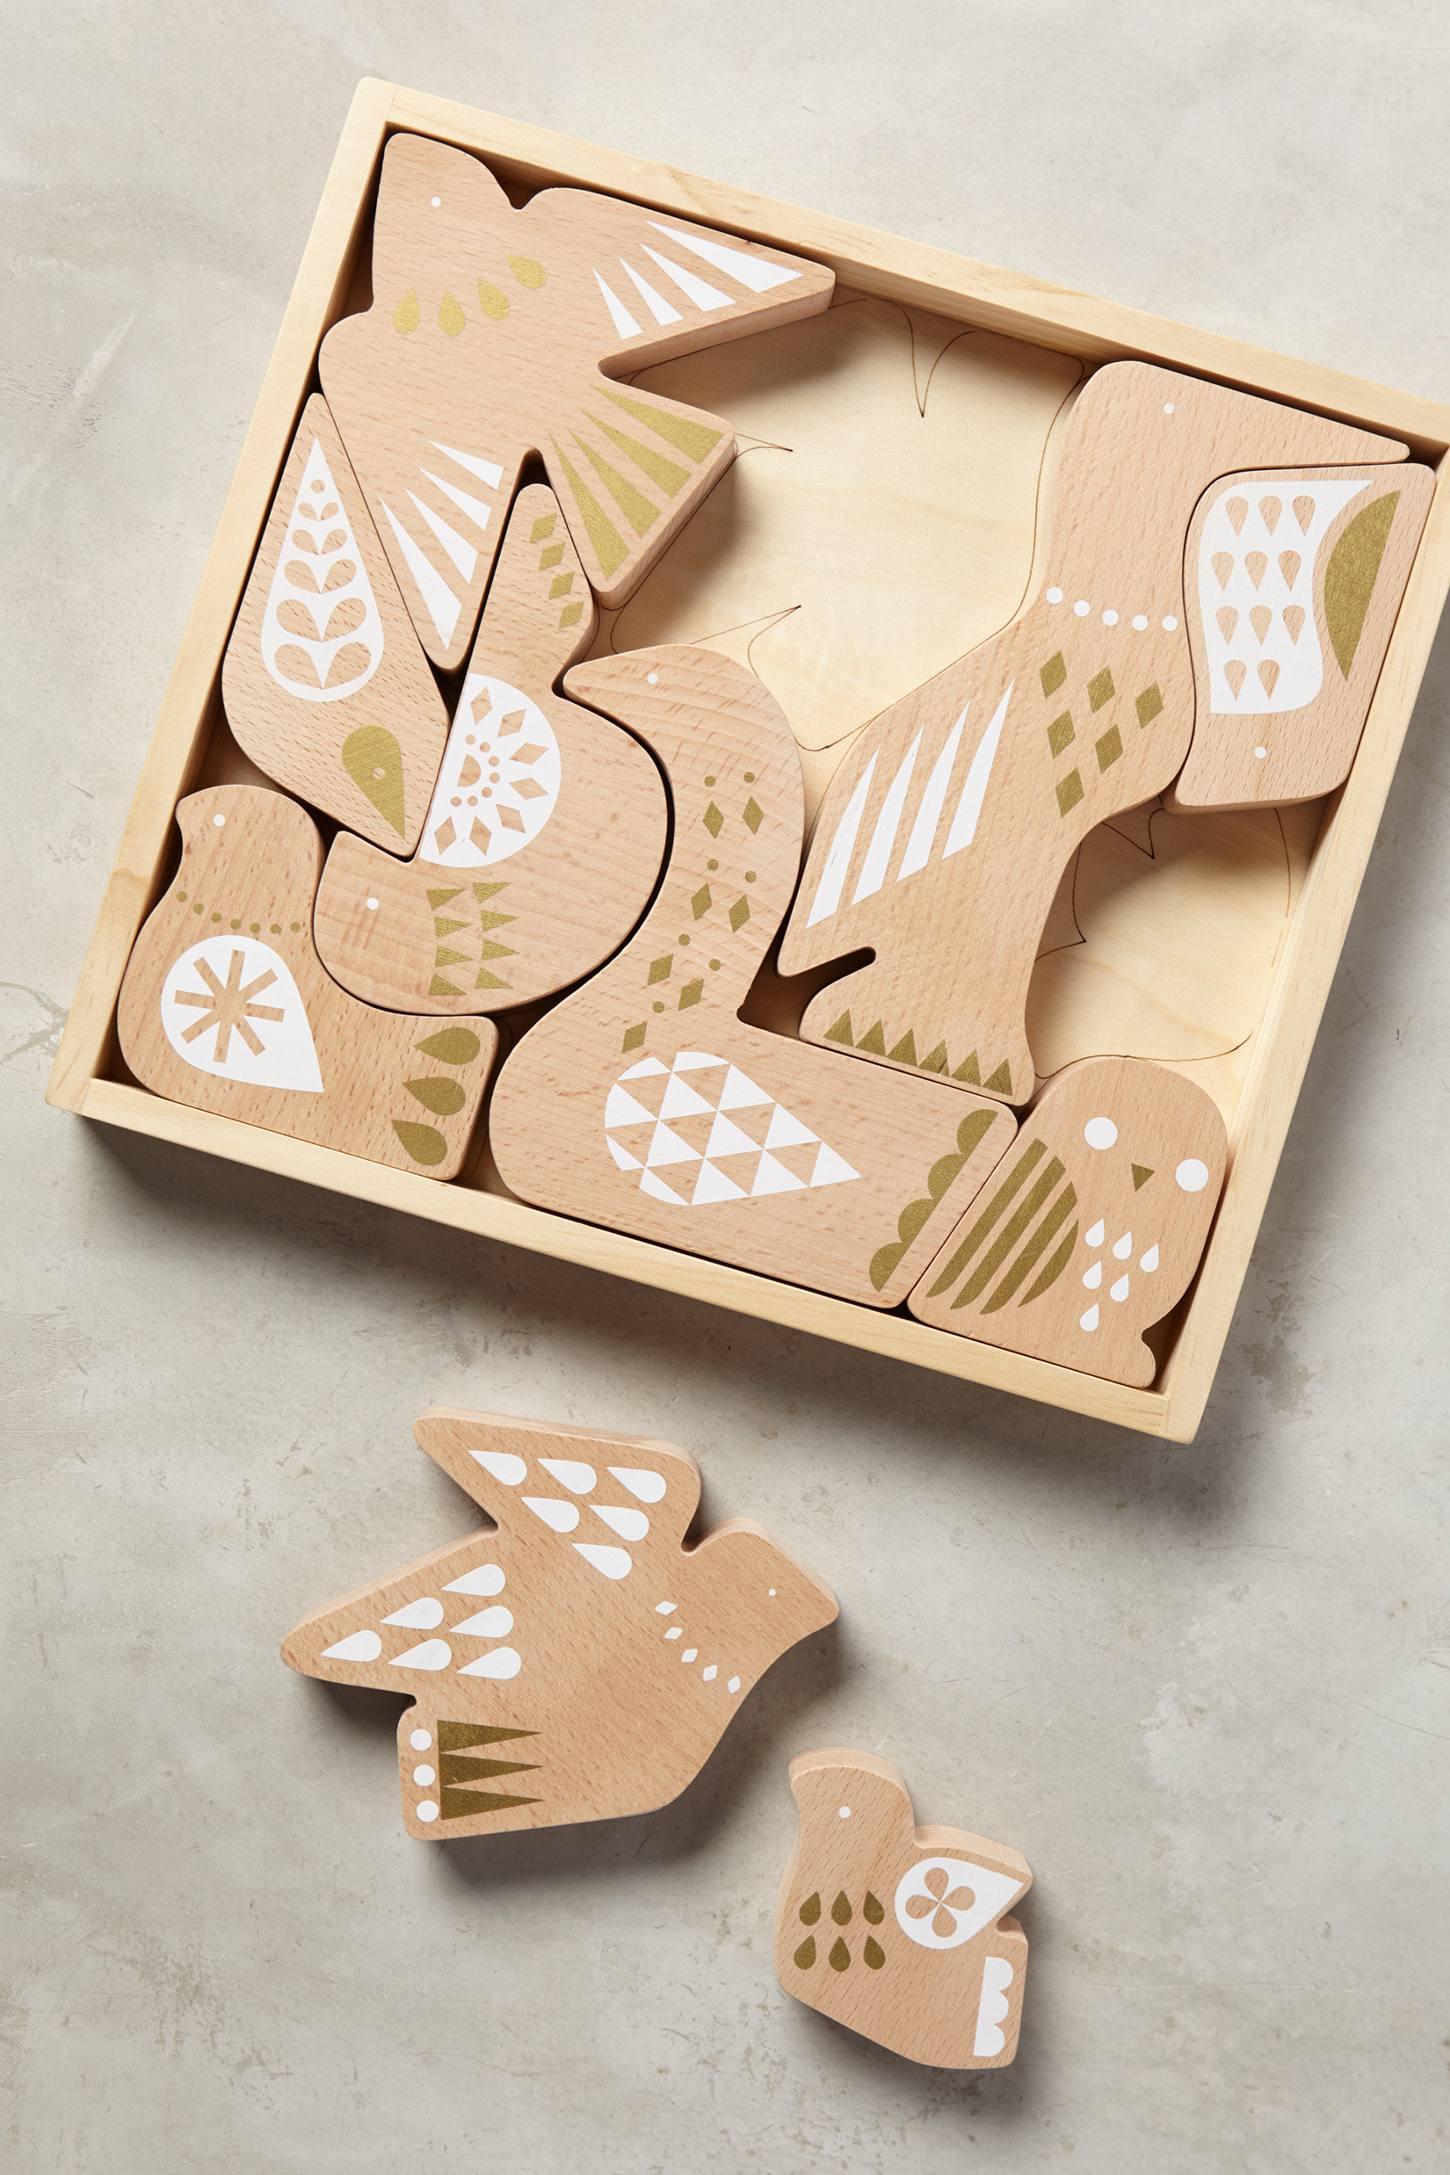 Flock Together Puzzle